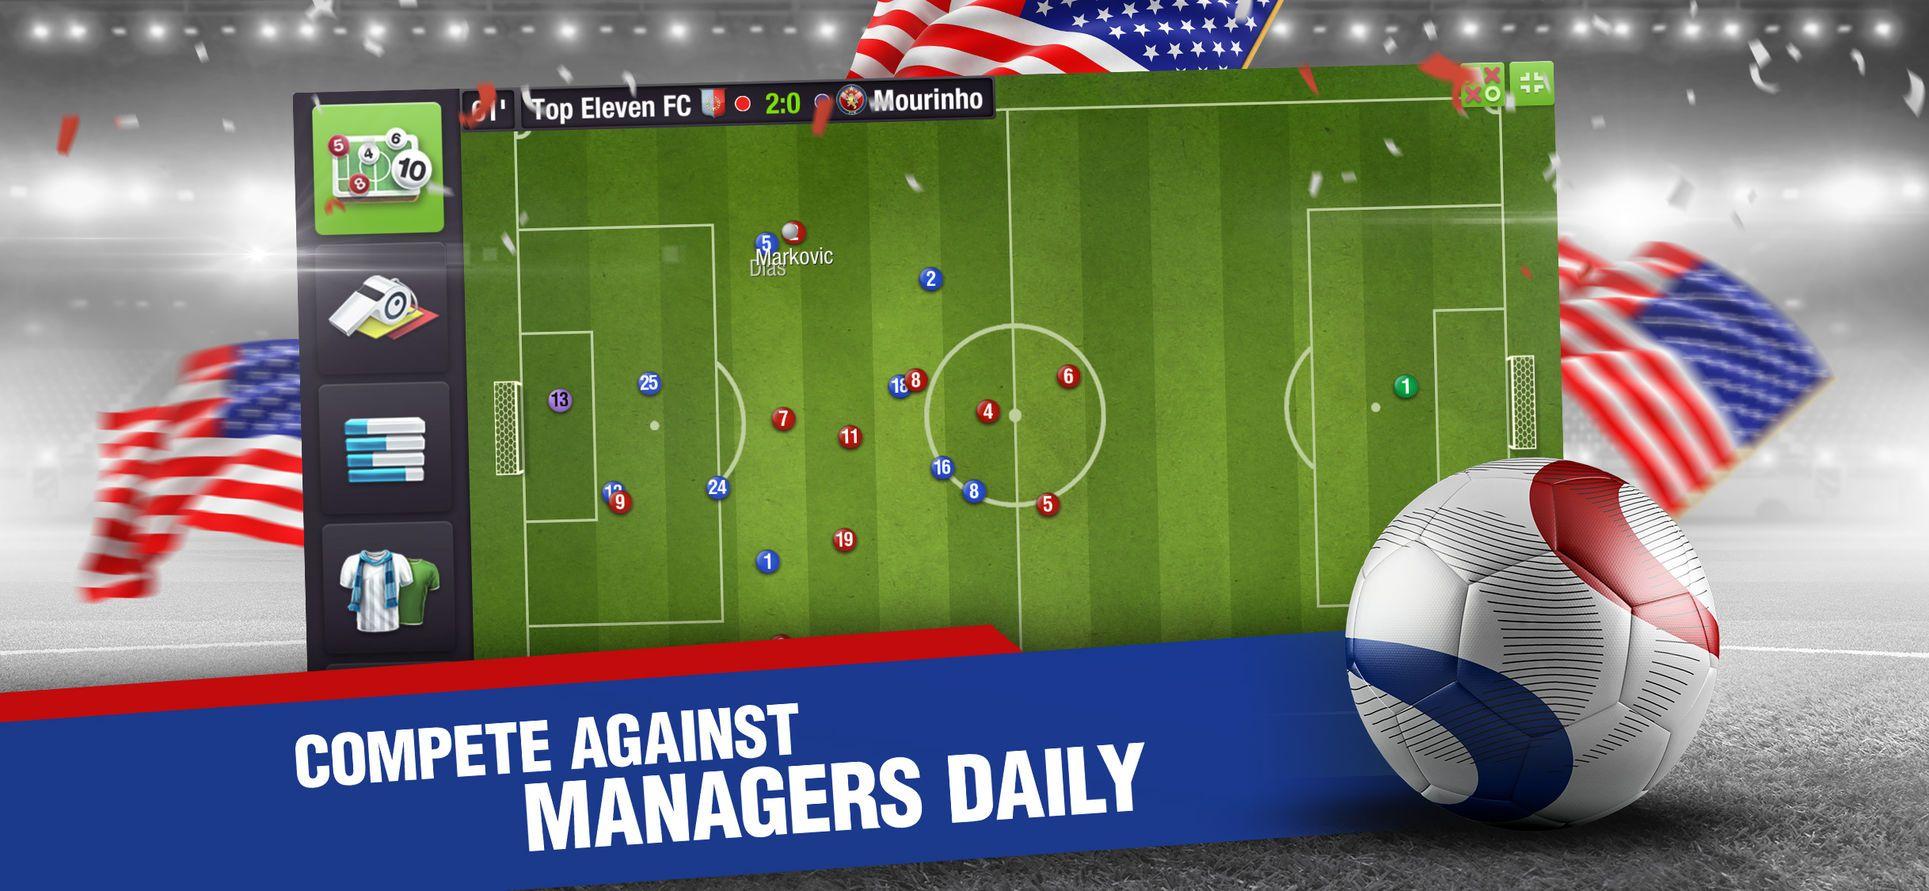 Top Eleven 2018 Soccer Manager GamesNordeusSportsios